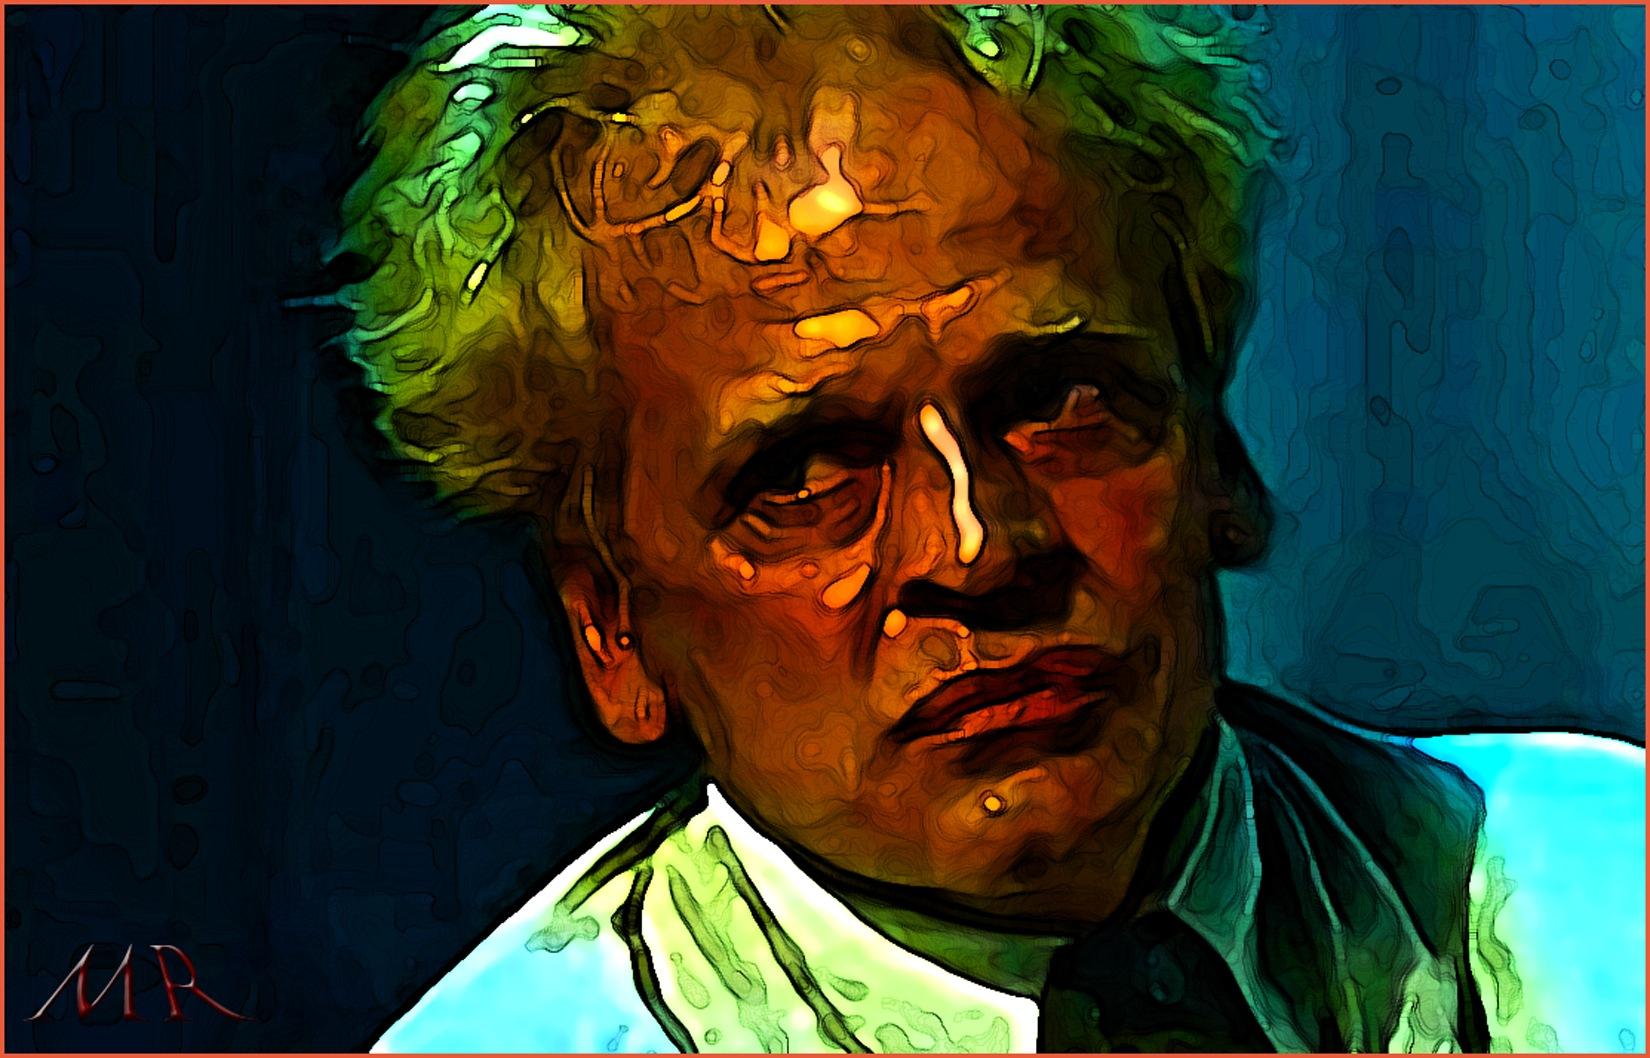 Klaus Kinski by Mikael Rennerhorn